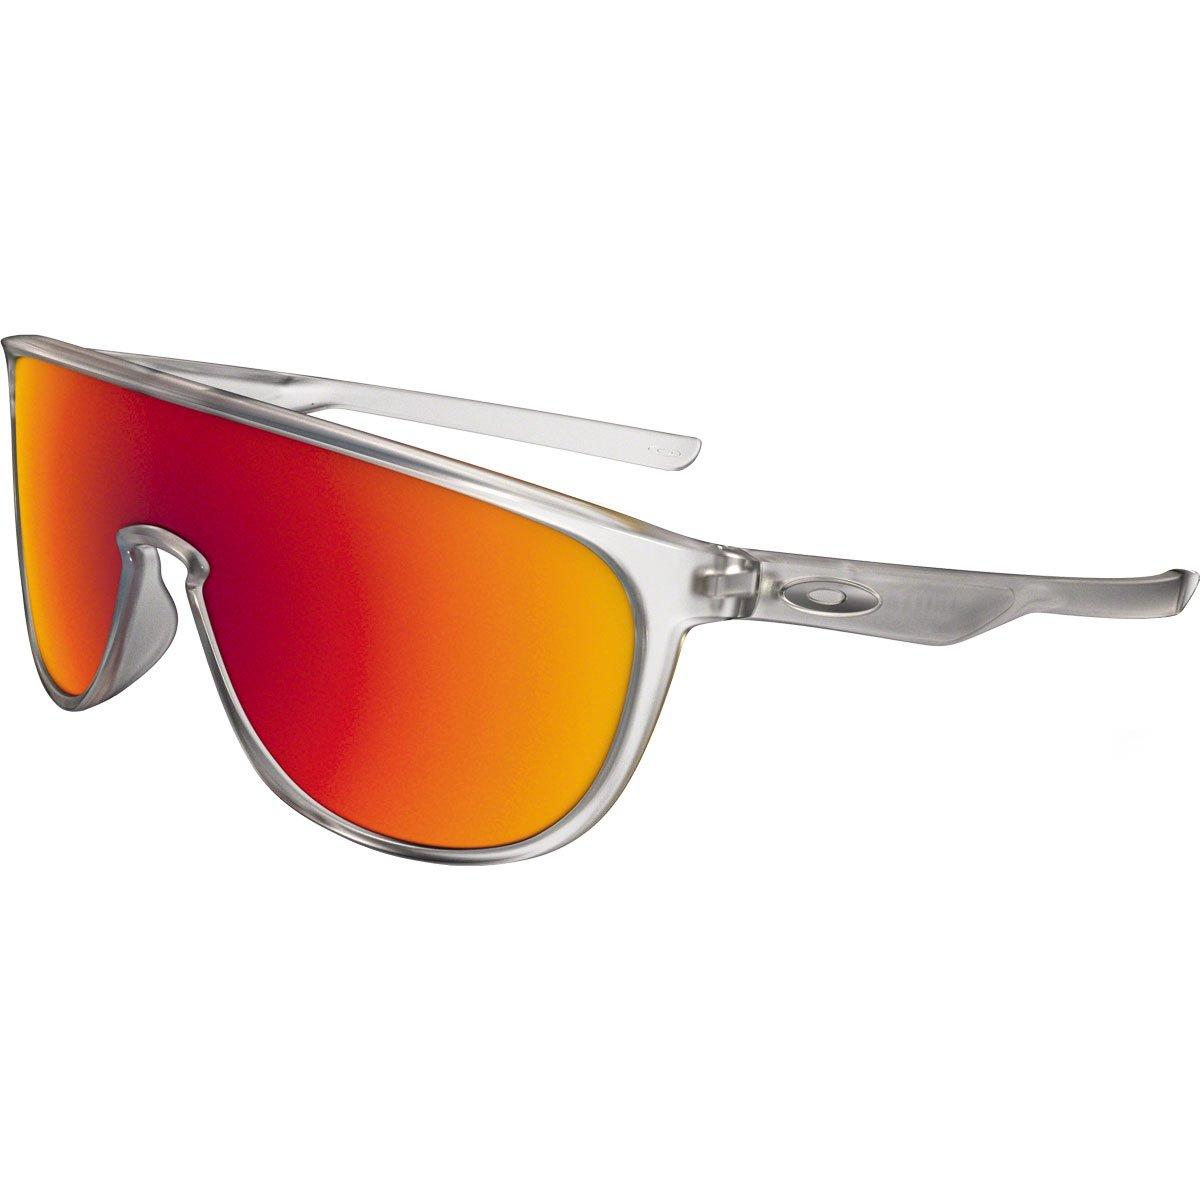 Oakley Ray-Ban Trillbe Gafas de sol, Rectangulares, 1, Transparente